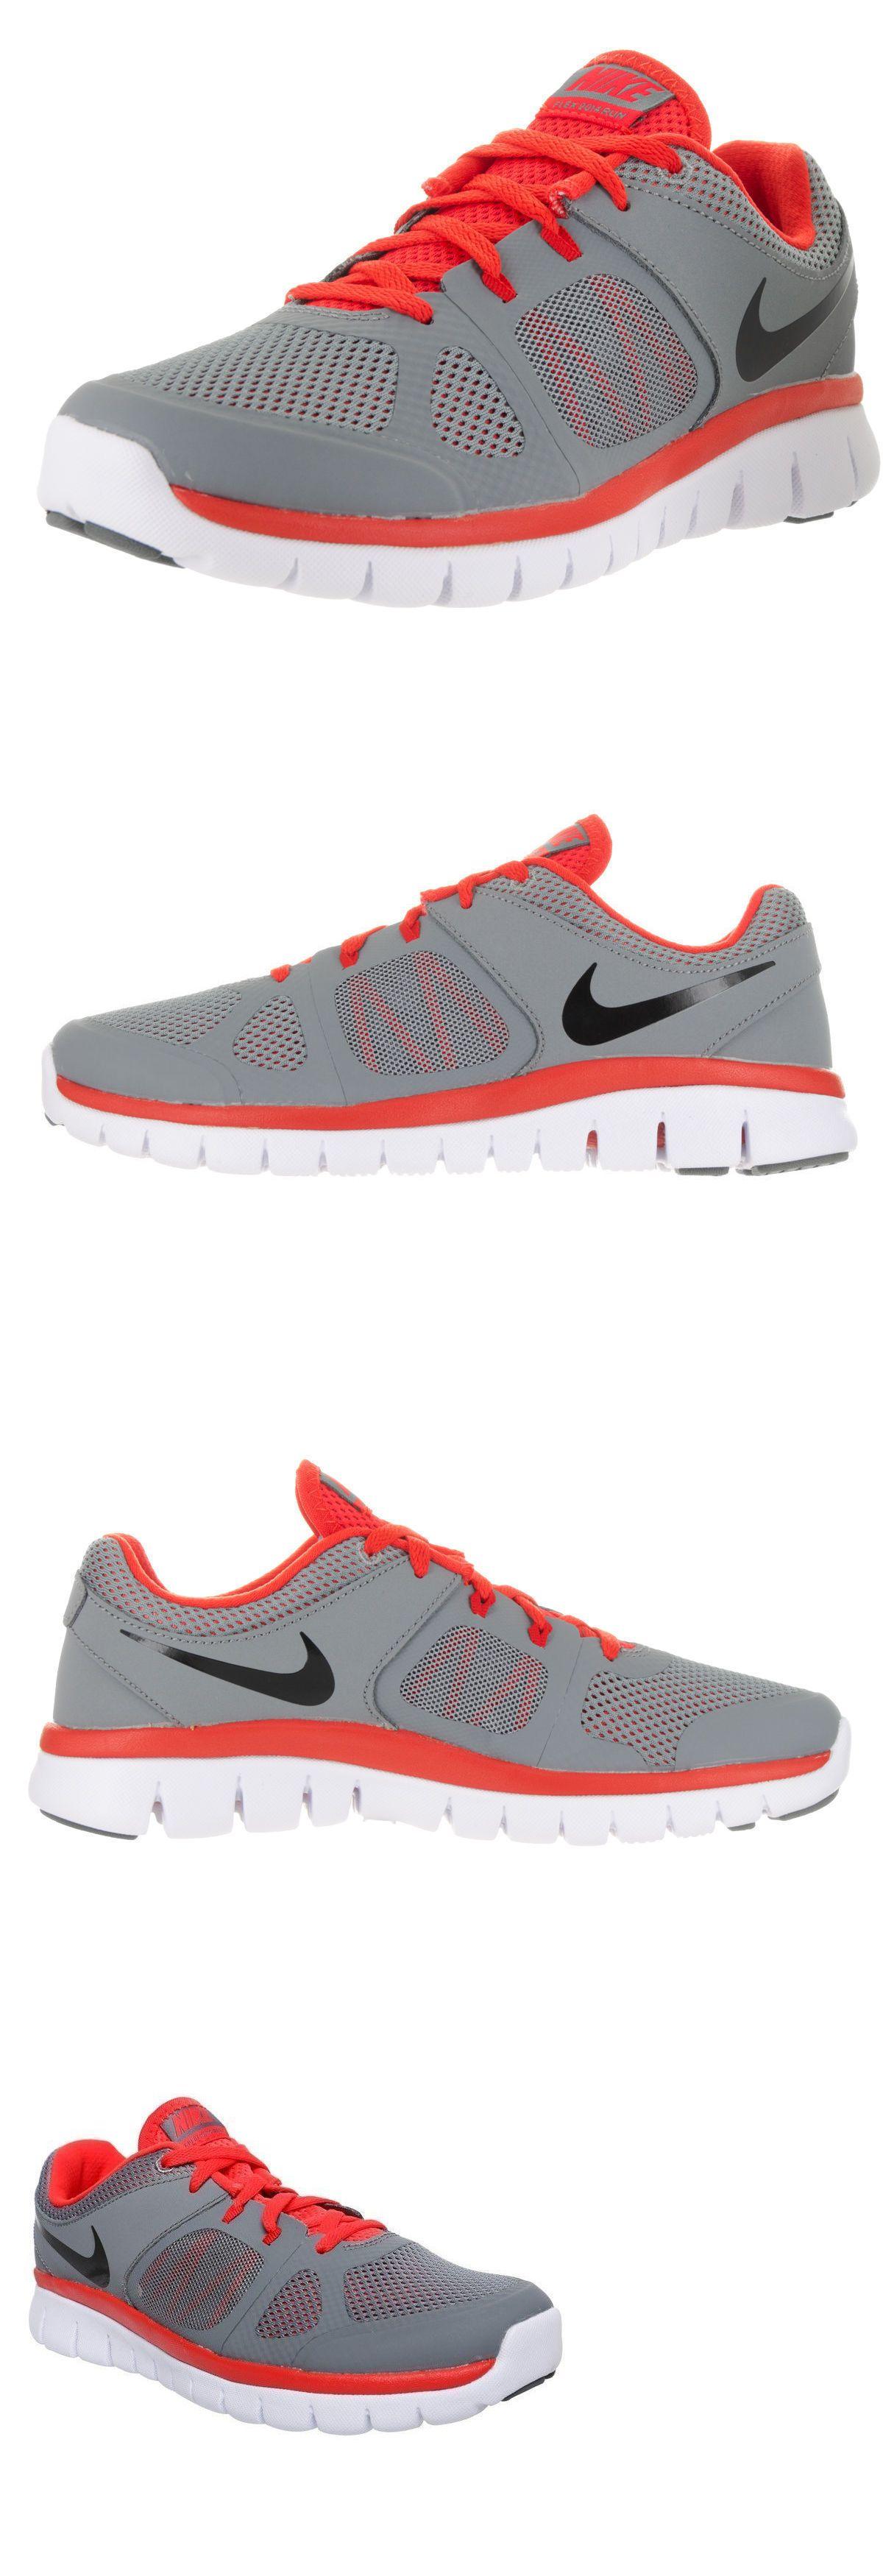 165e9170ce5dc Youth 158954  Nike Flex 2014 Rn (Gs) 643241-008 Cool Gray Mesh ...